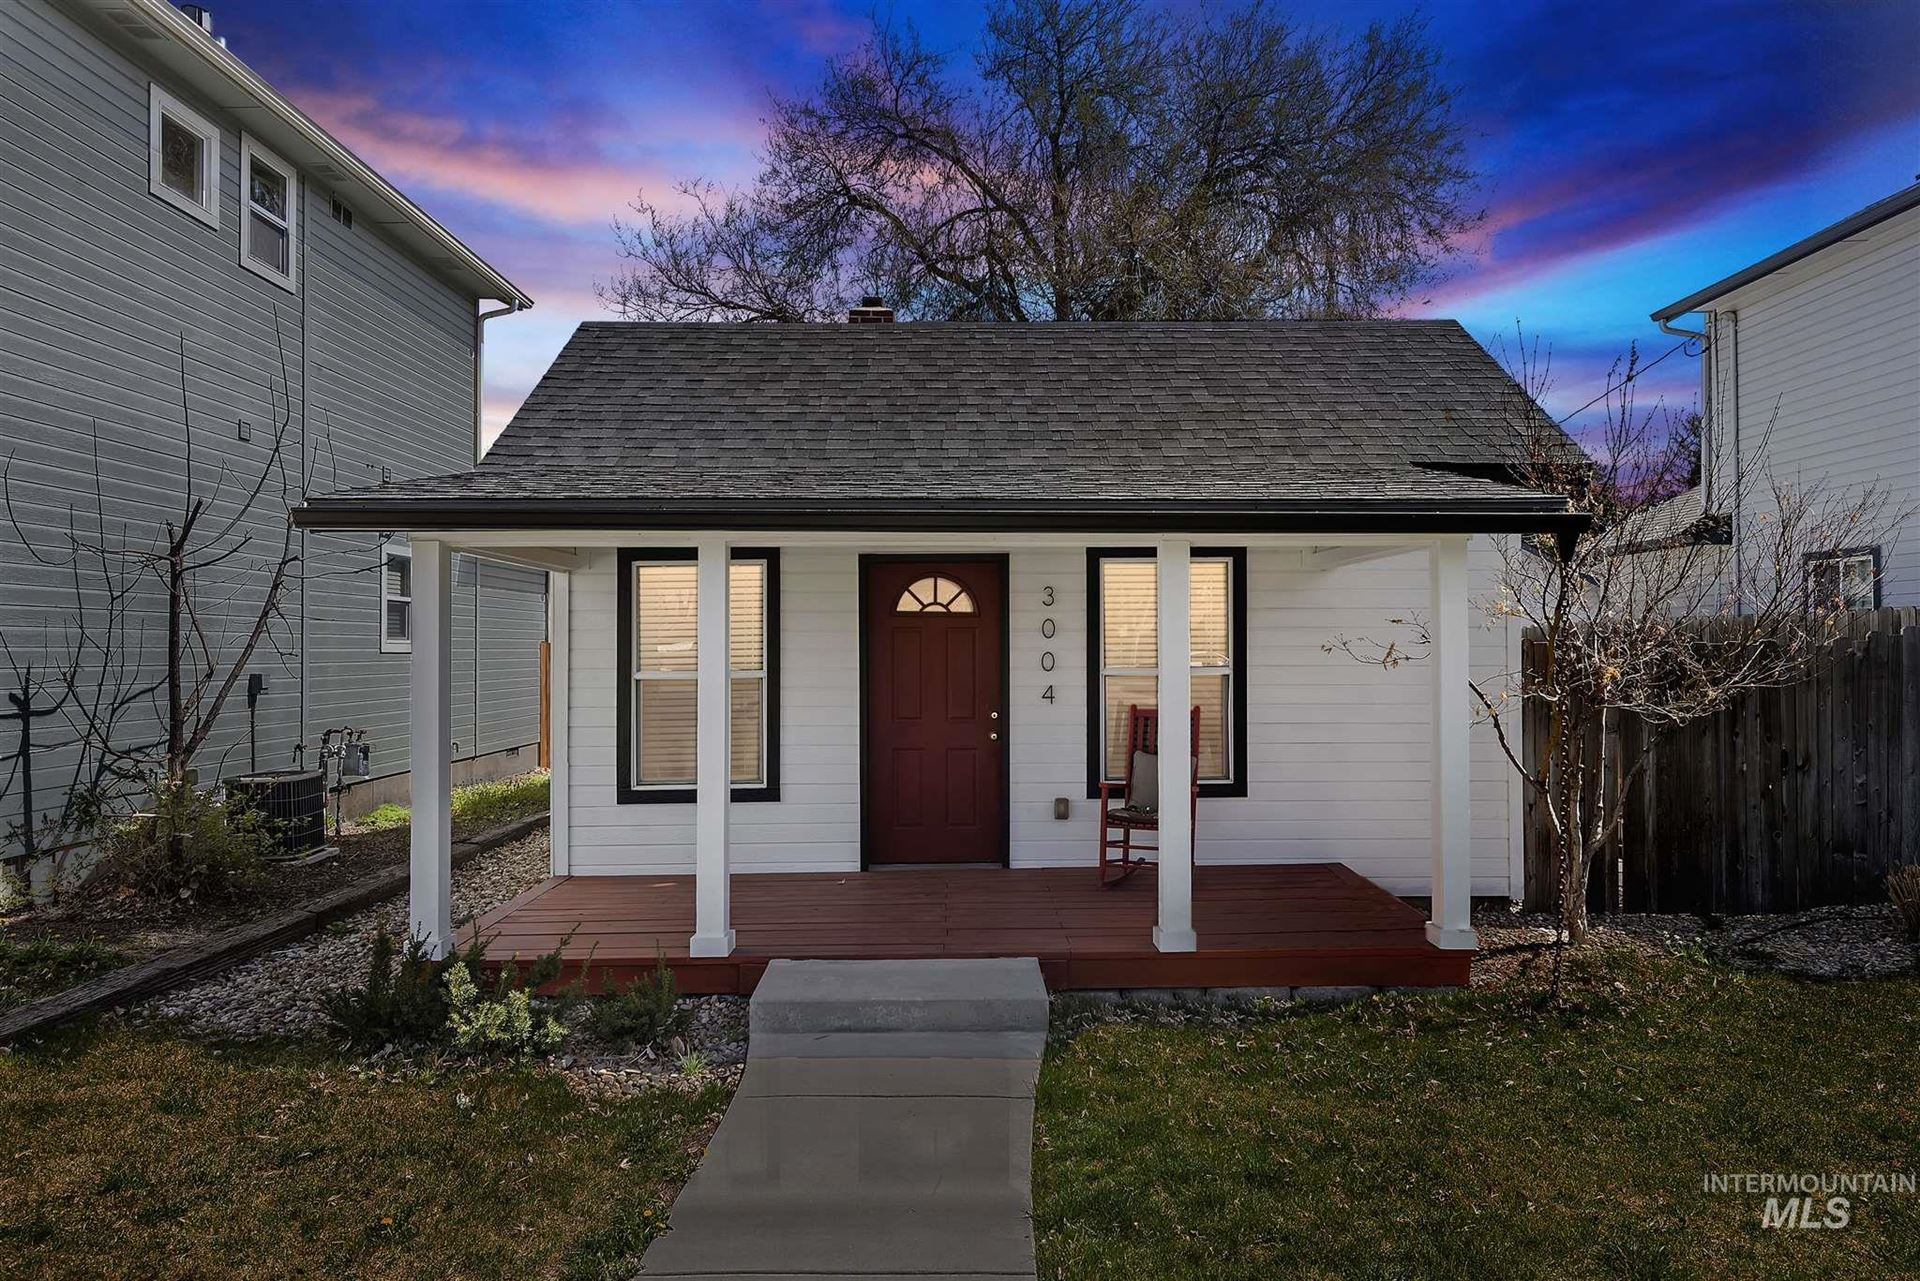 Photo of 3004 N 36th Street, Boise, ID 83703 (MLS # 98798939)